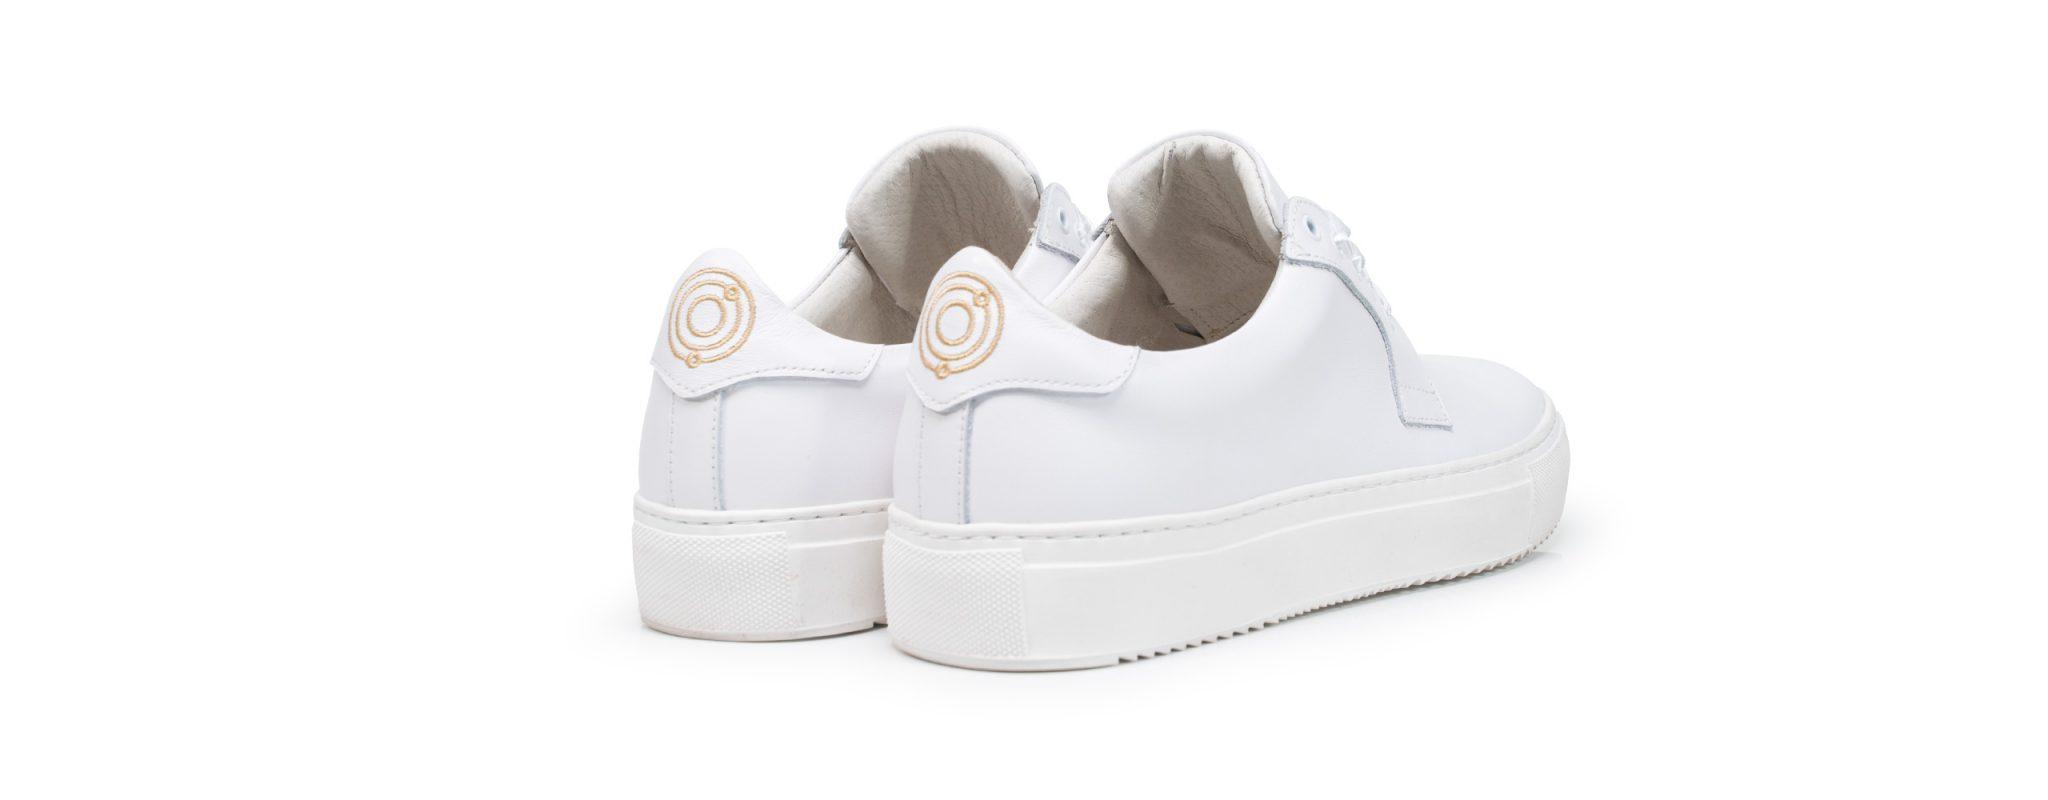 basket blanche style stan smith delta subtle subtle shoes. Black Bedroom Furniture Sets. Home Design Ideas